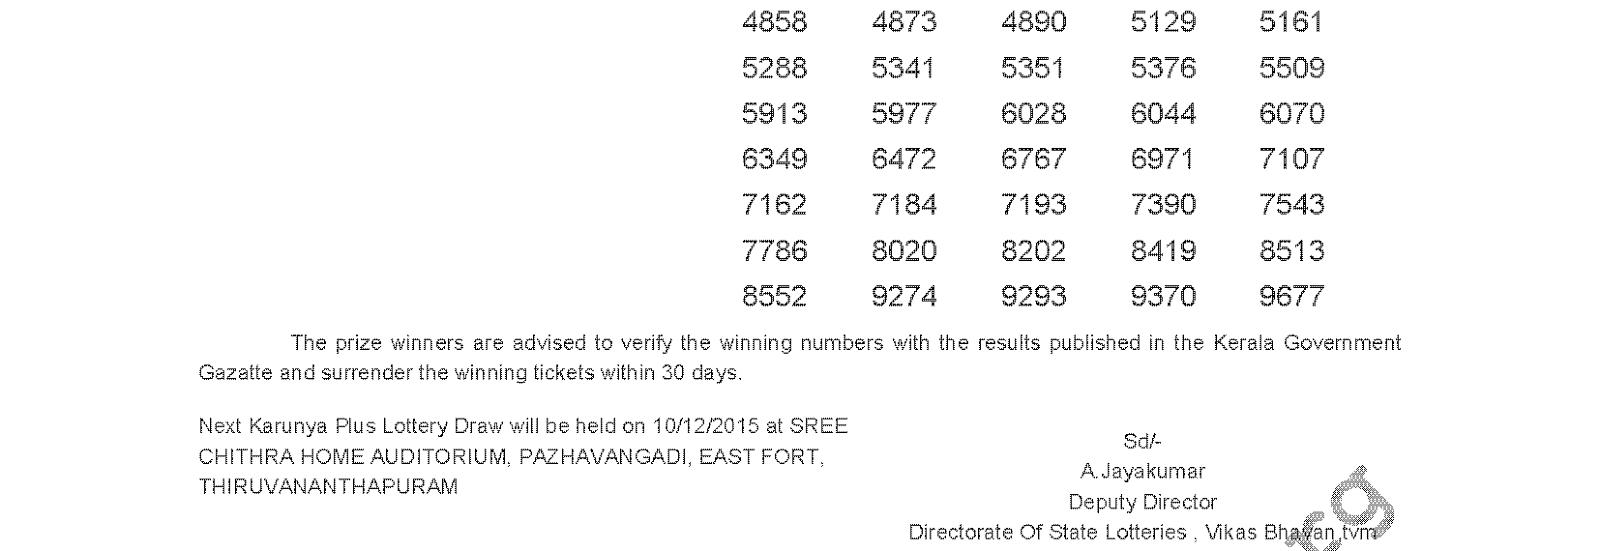 Karunya Plus Lottery KN 86 Result 03-12-2015